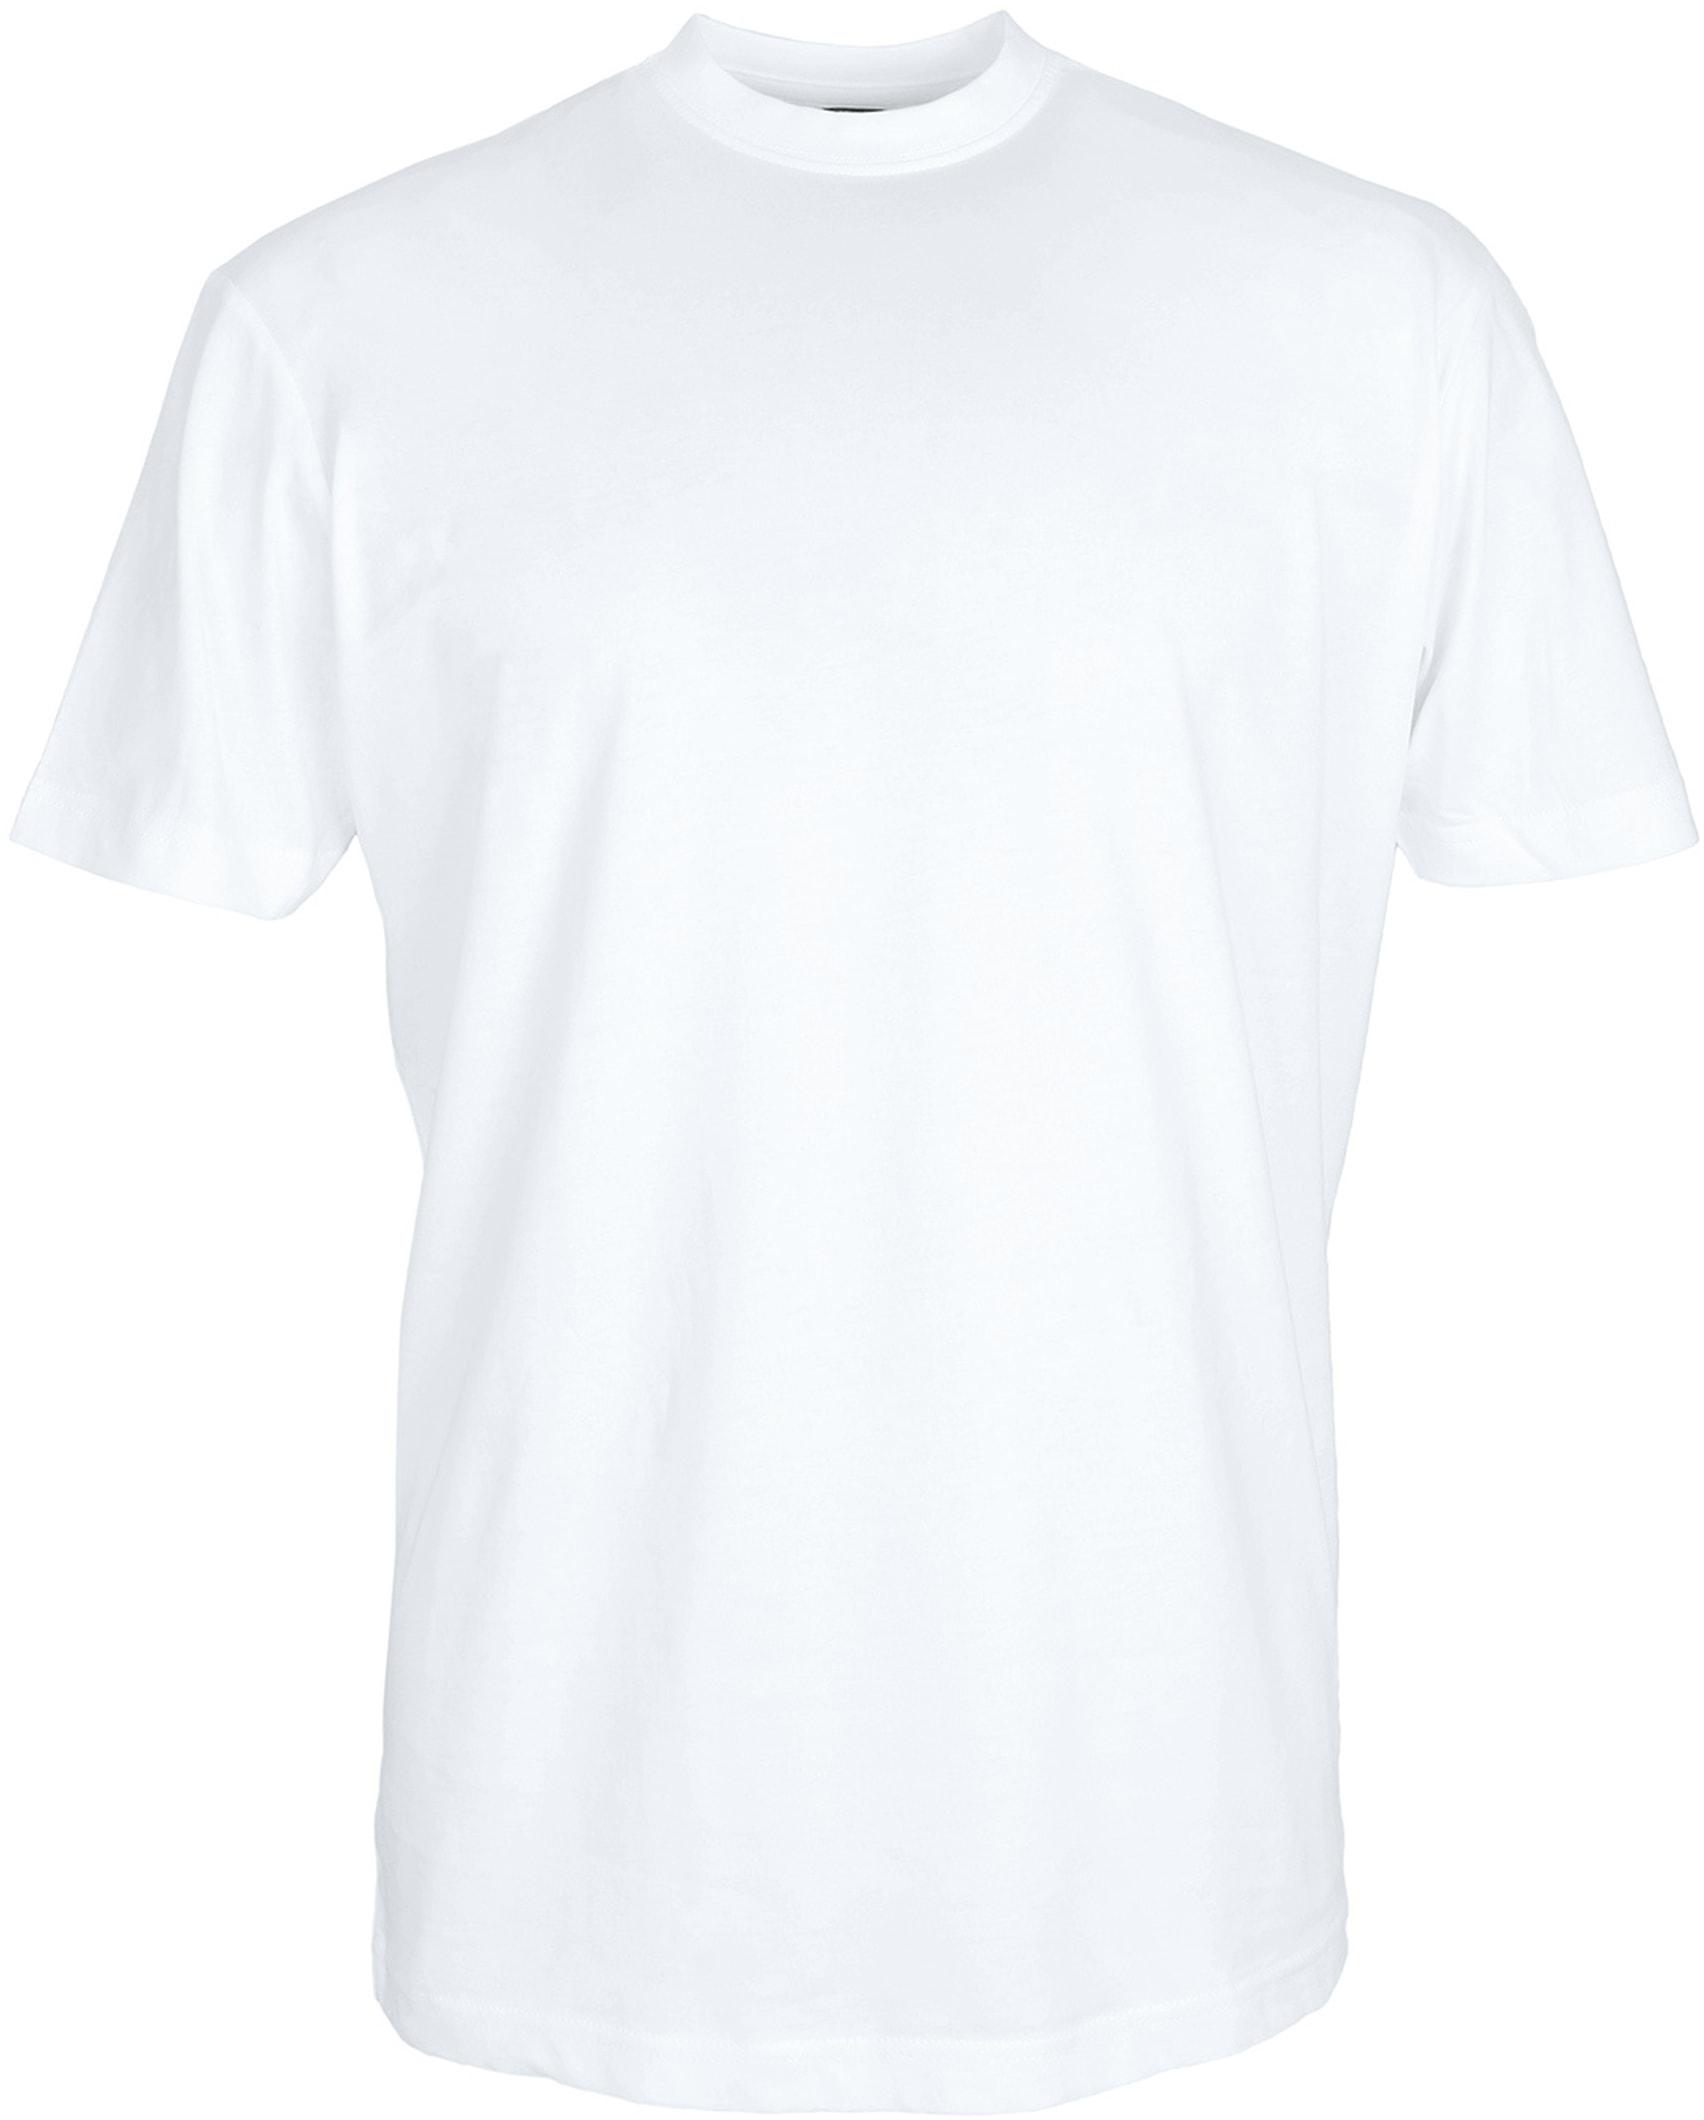 T-shirt Brede Ronde Hals 2Pack foto 1